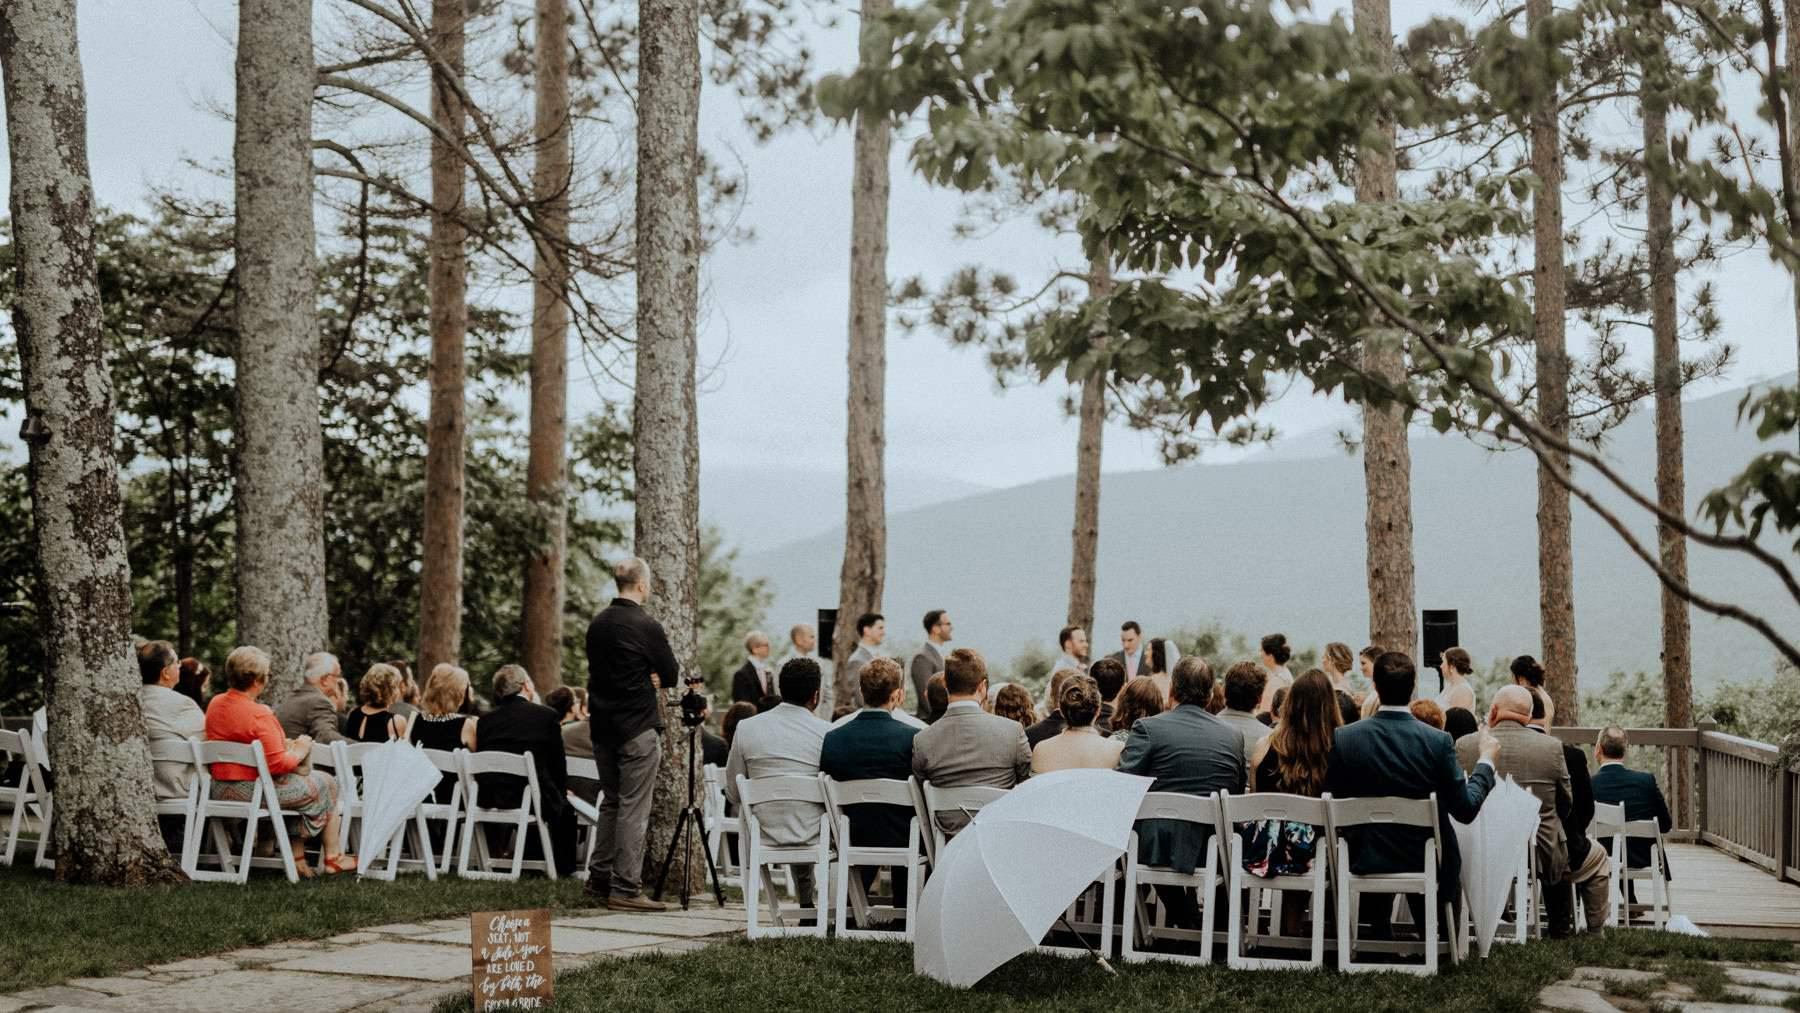 Onteora-Mountain-House-wedding-photographer-98.jpg